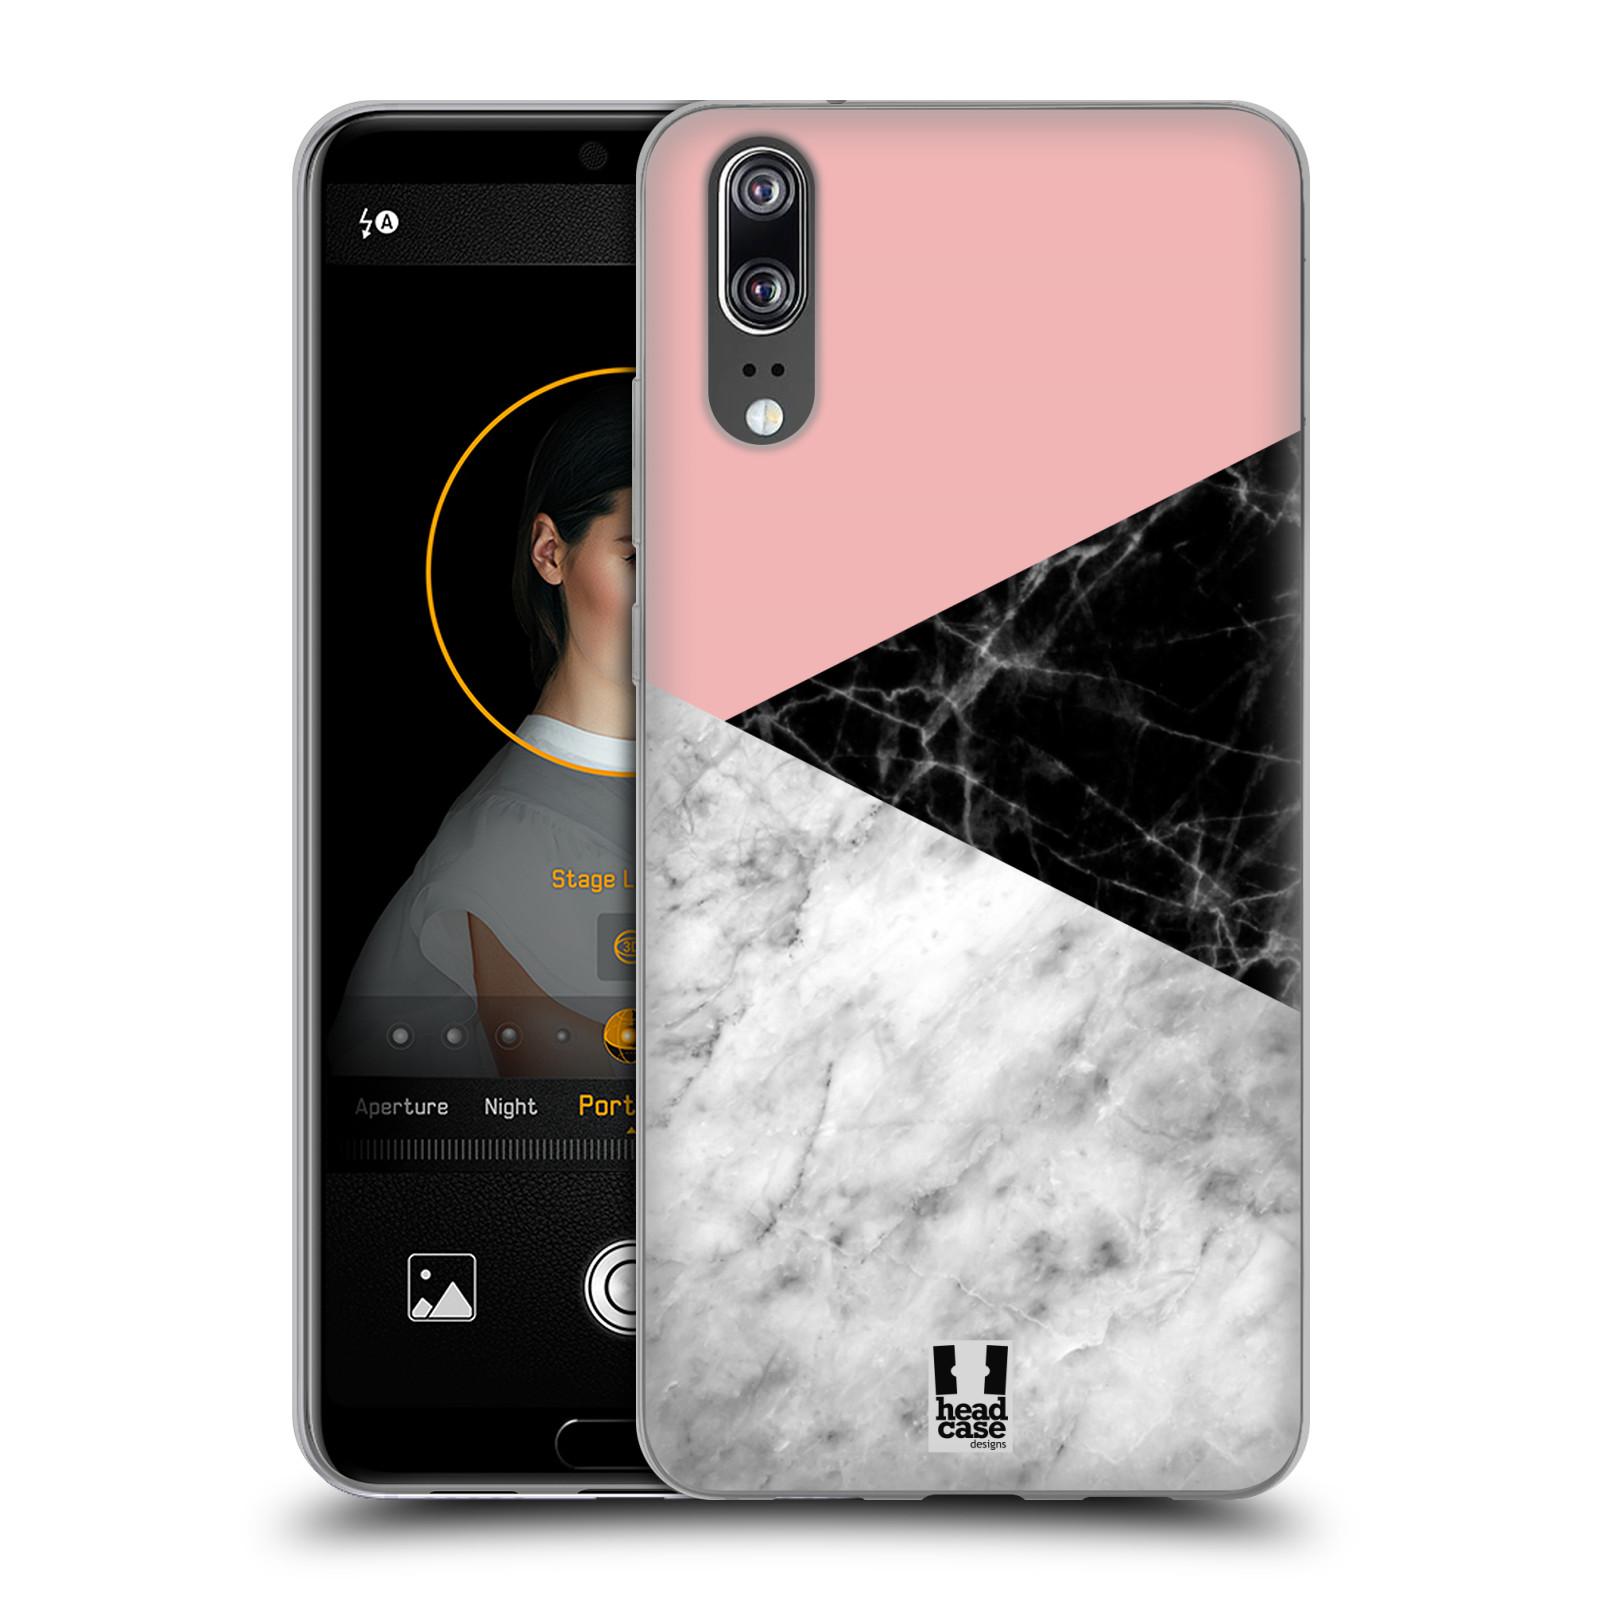 Silikonové pouzdro na mobil Huawei P20 - Head Case - Mramor mix